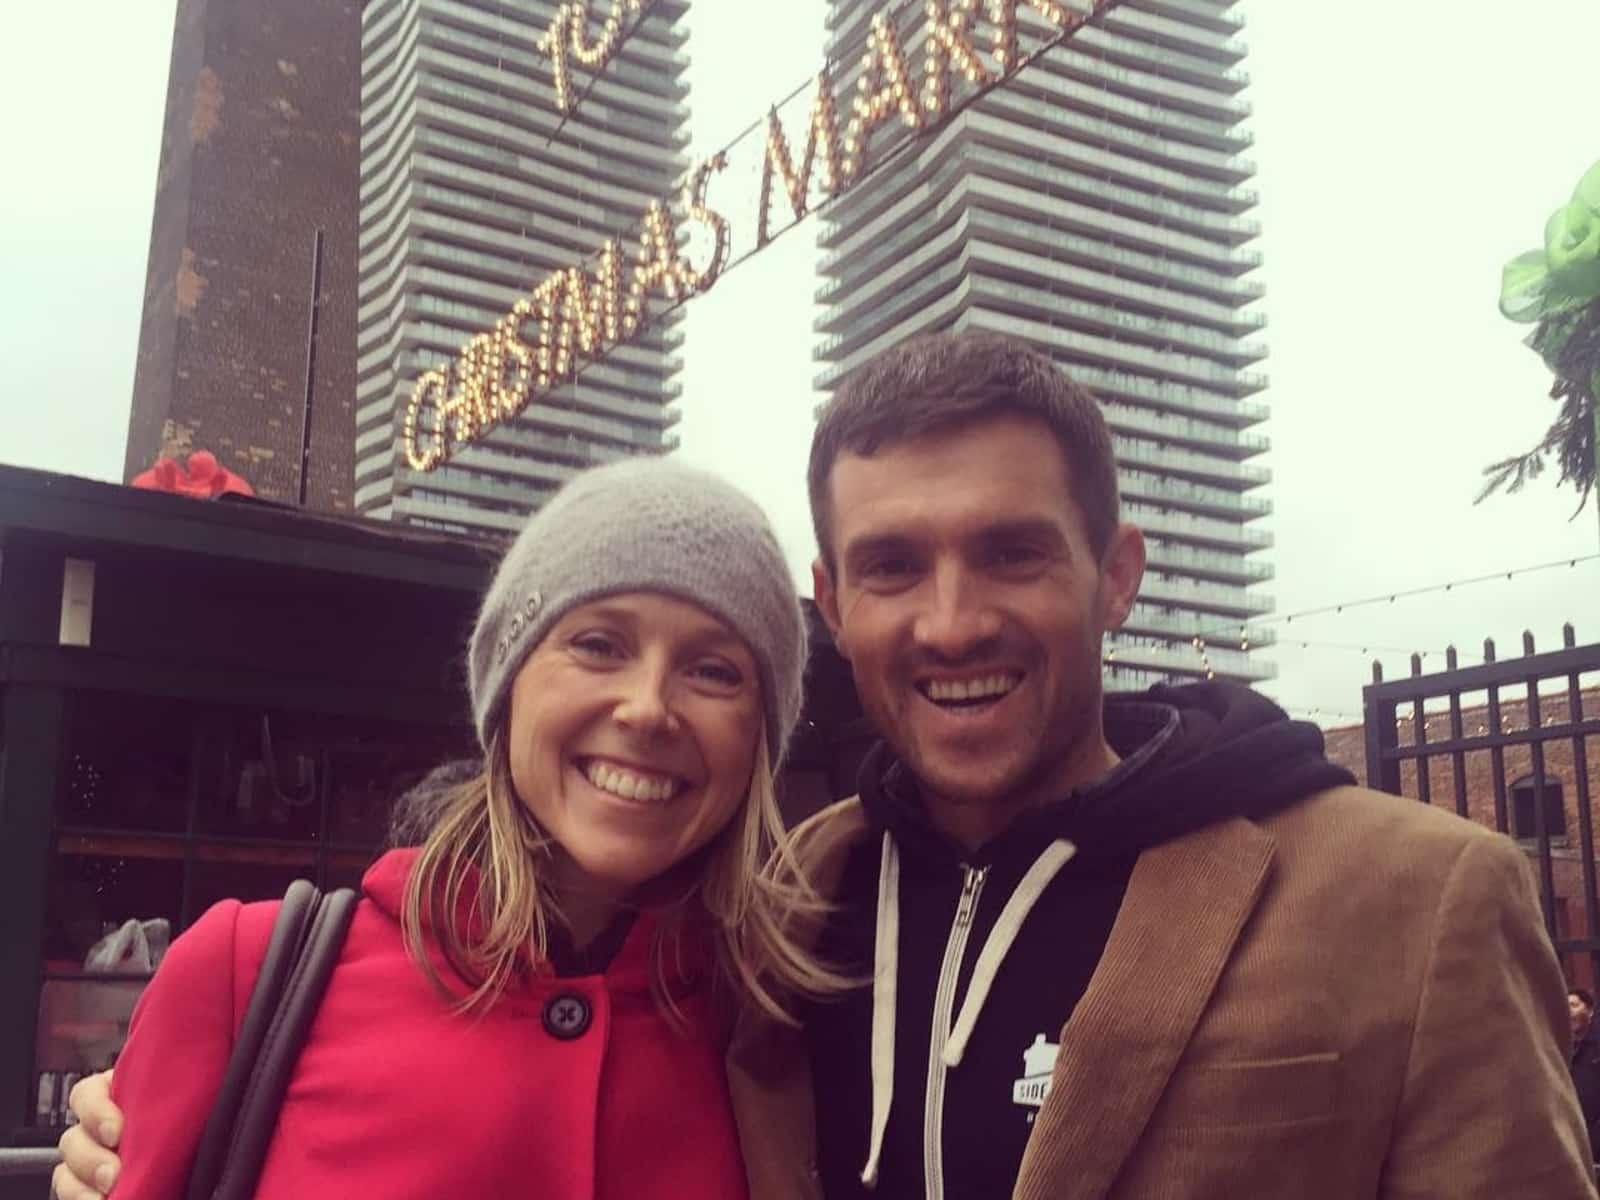 Laura & Jody from Girona, Spain